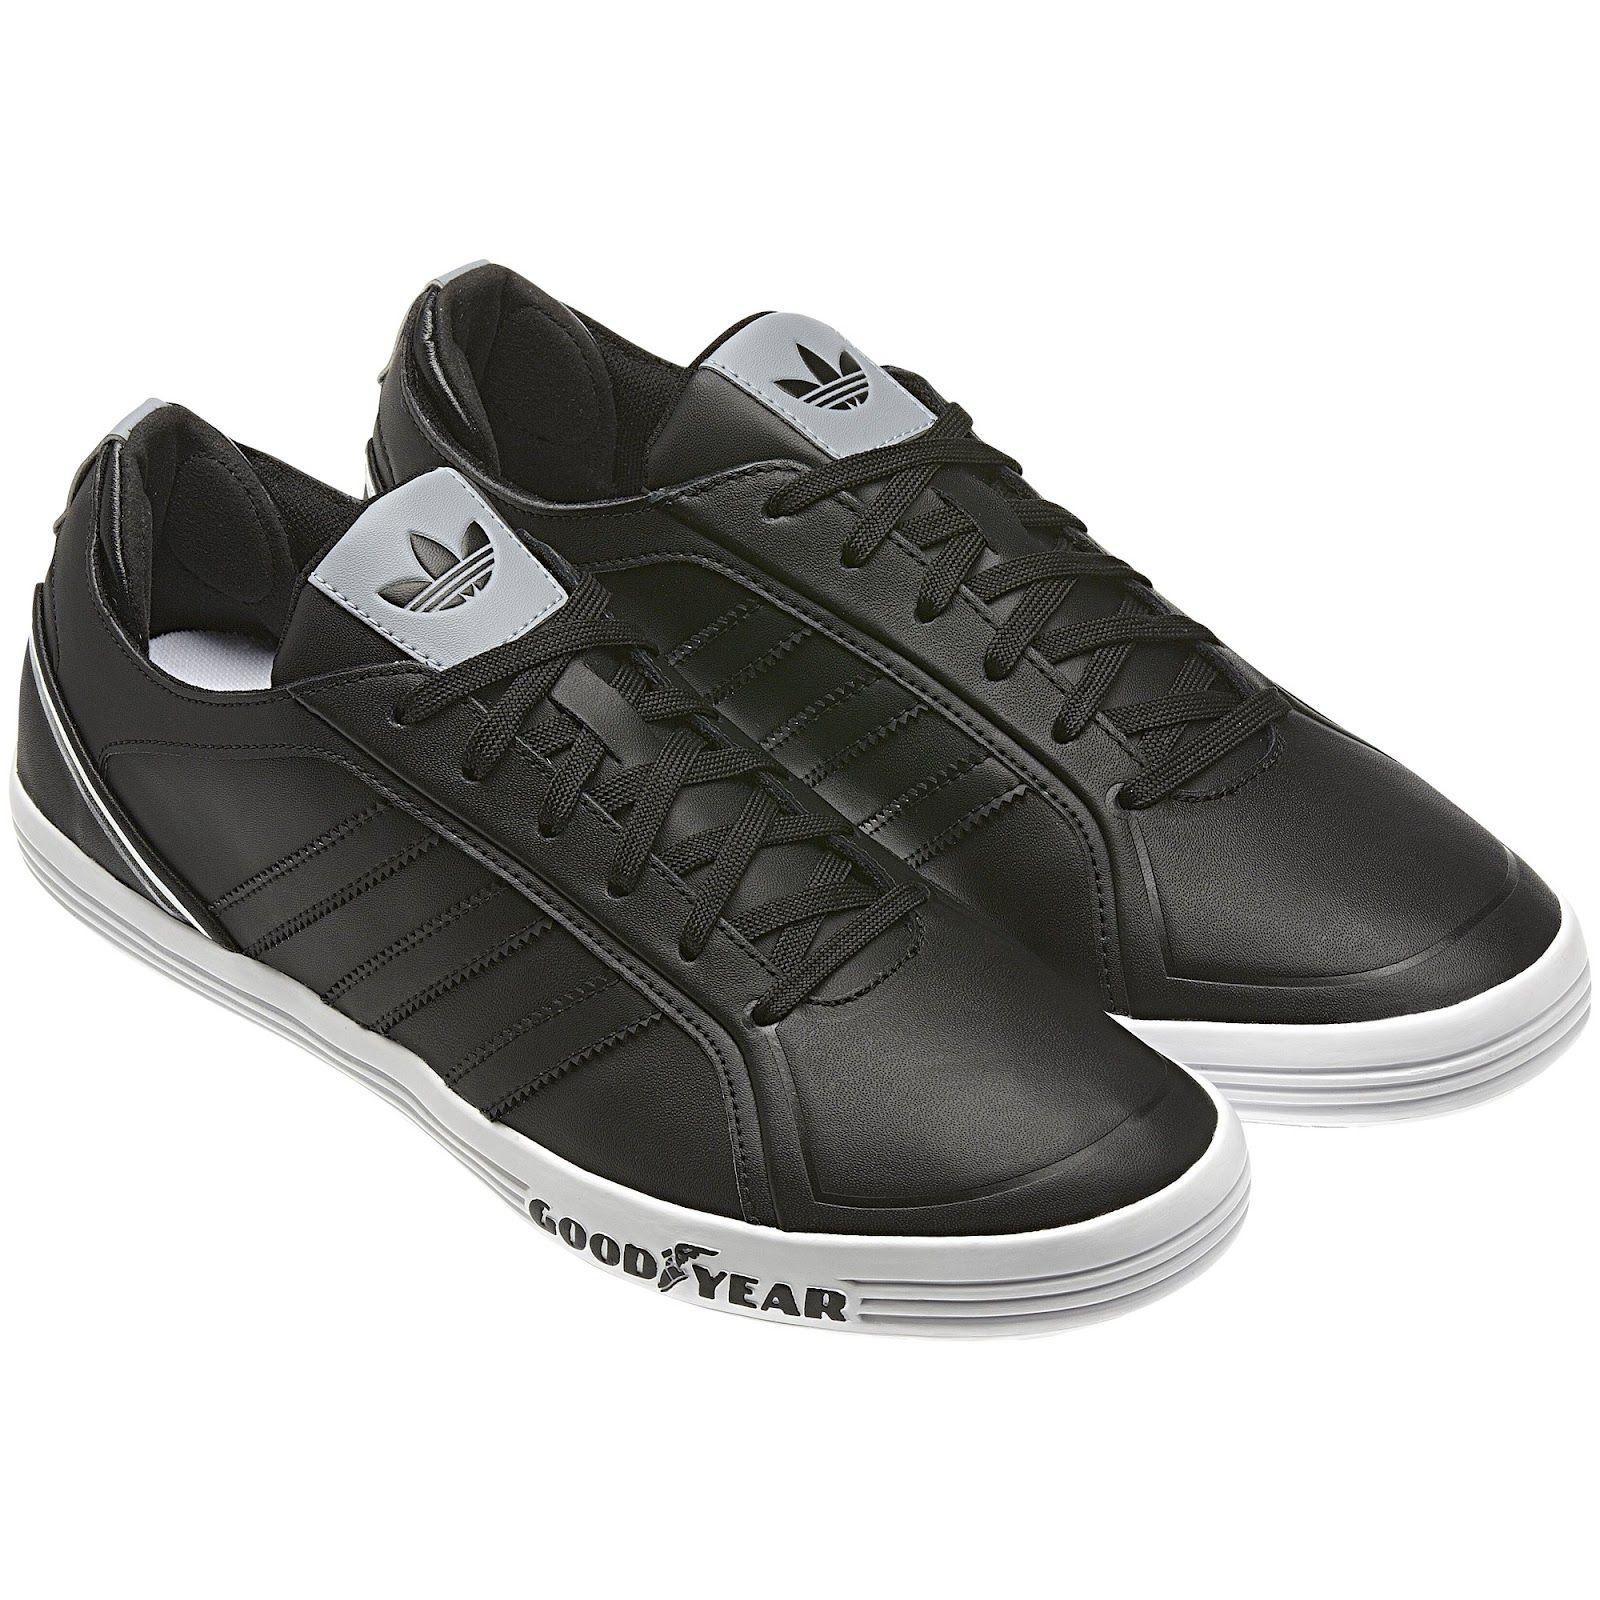 skor goodyear skor adidas adidas höga höga goodyear adidas skor höga adidas  goodyear wqXUg1rX e3574facb77f3